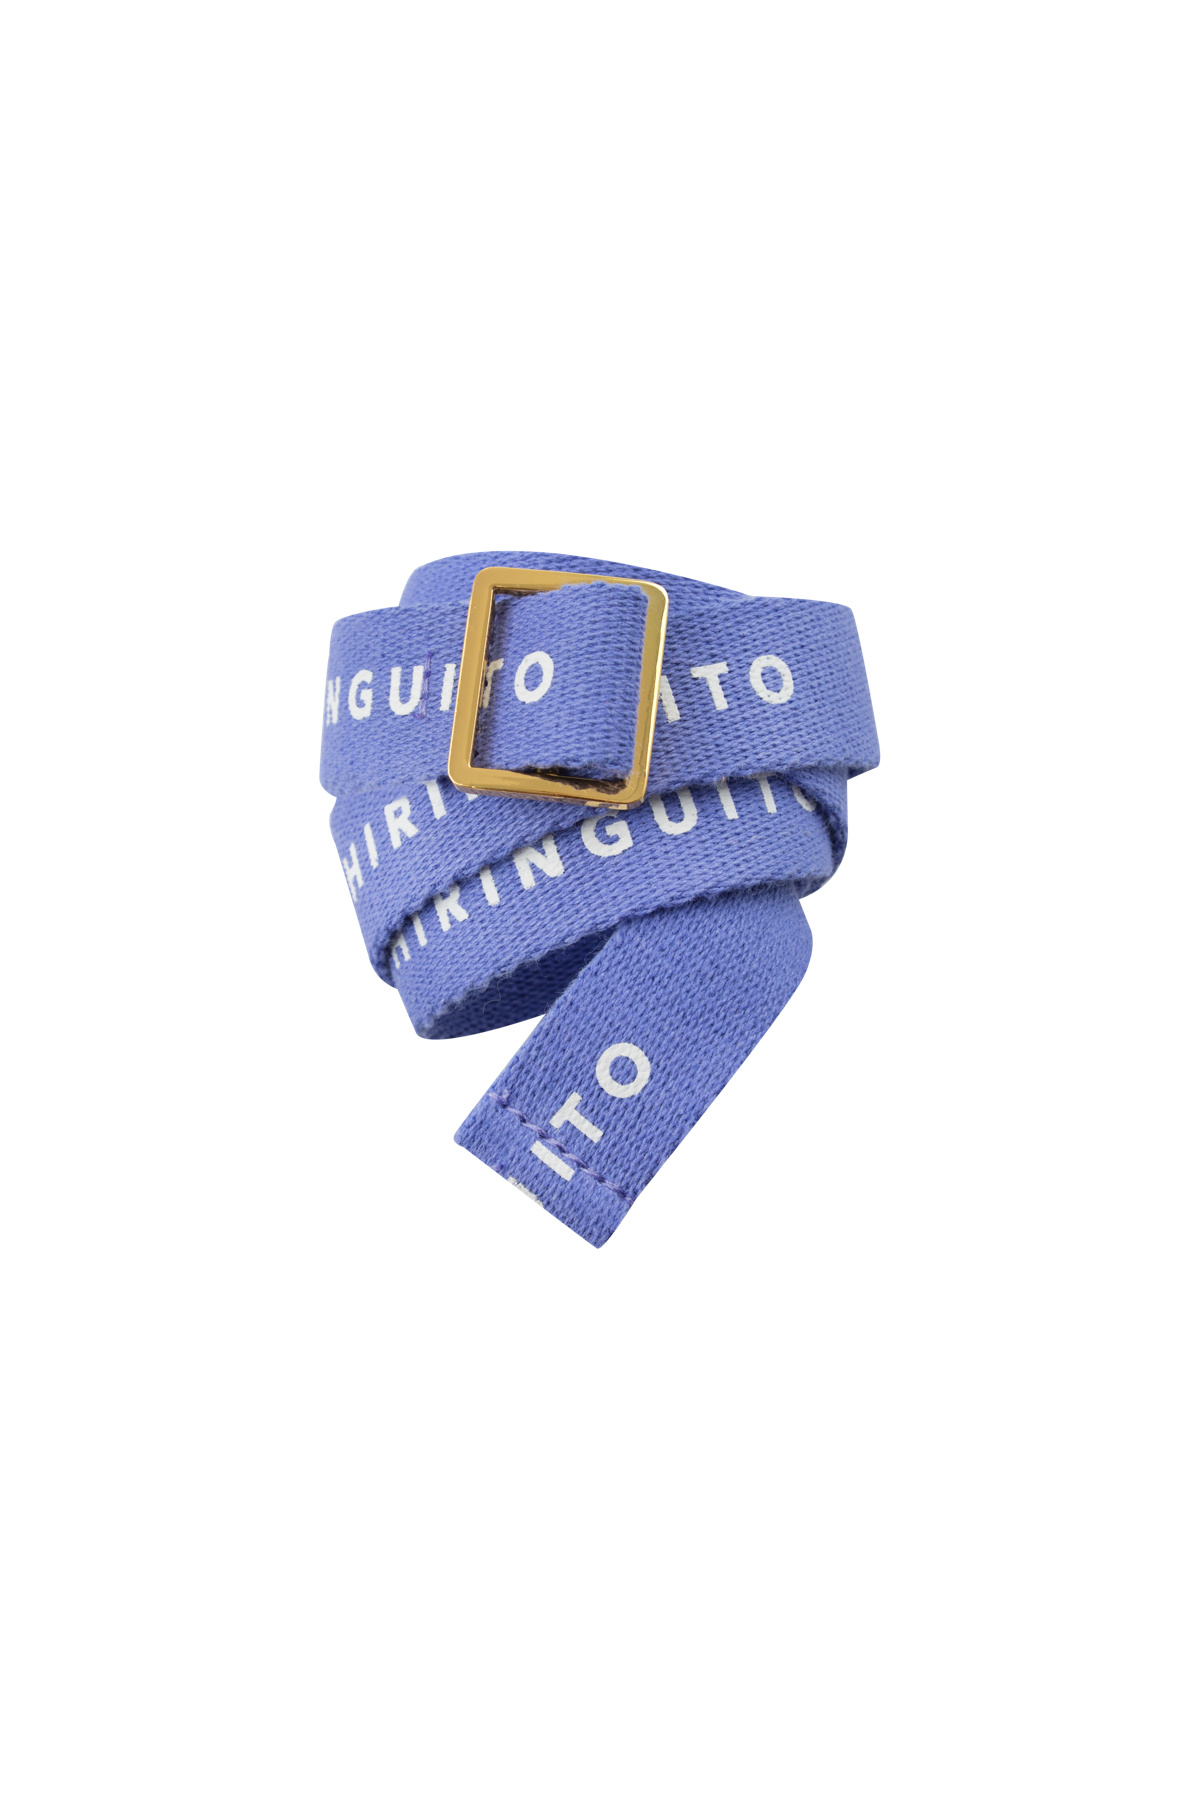 Tiny Chiringuito belt - Iris Blue / Off White-1